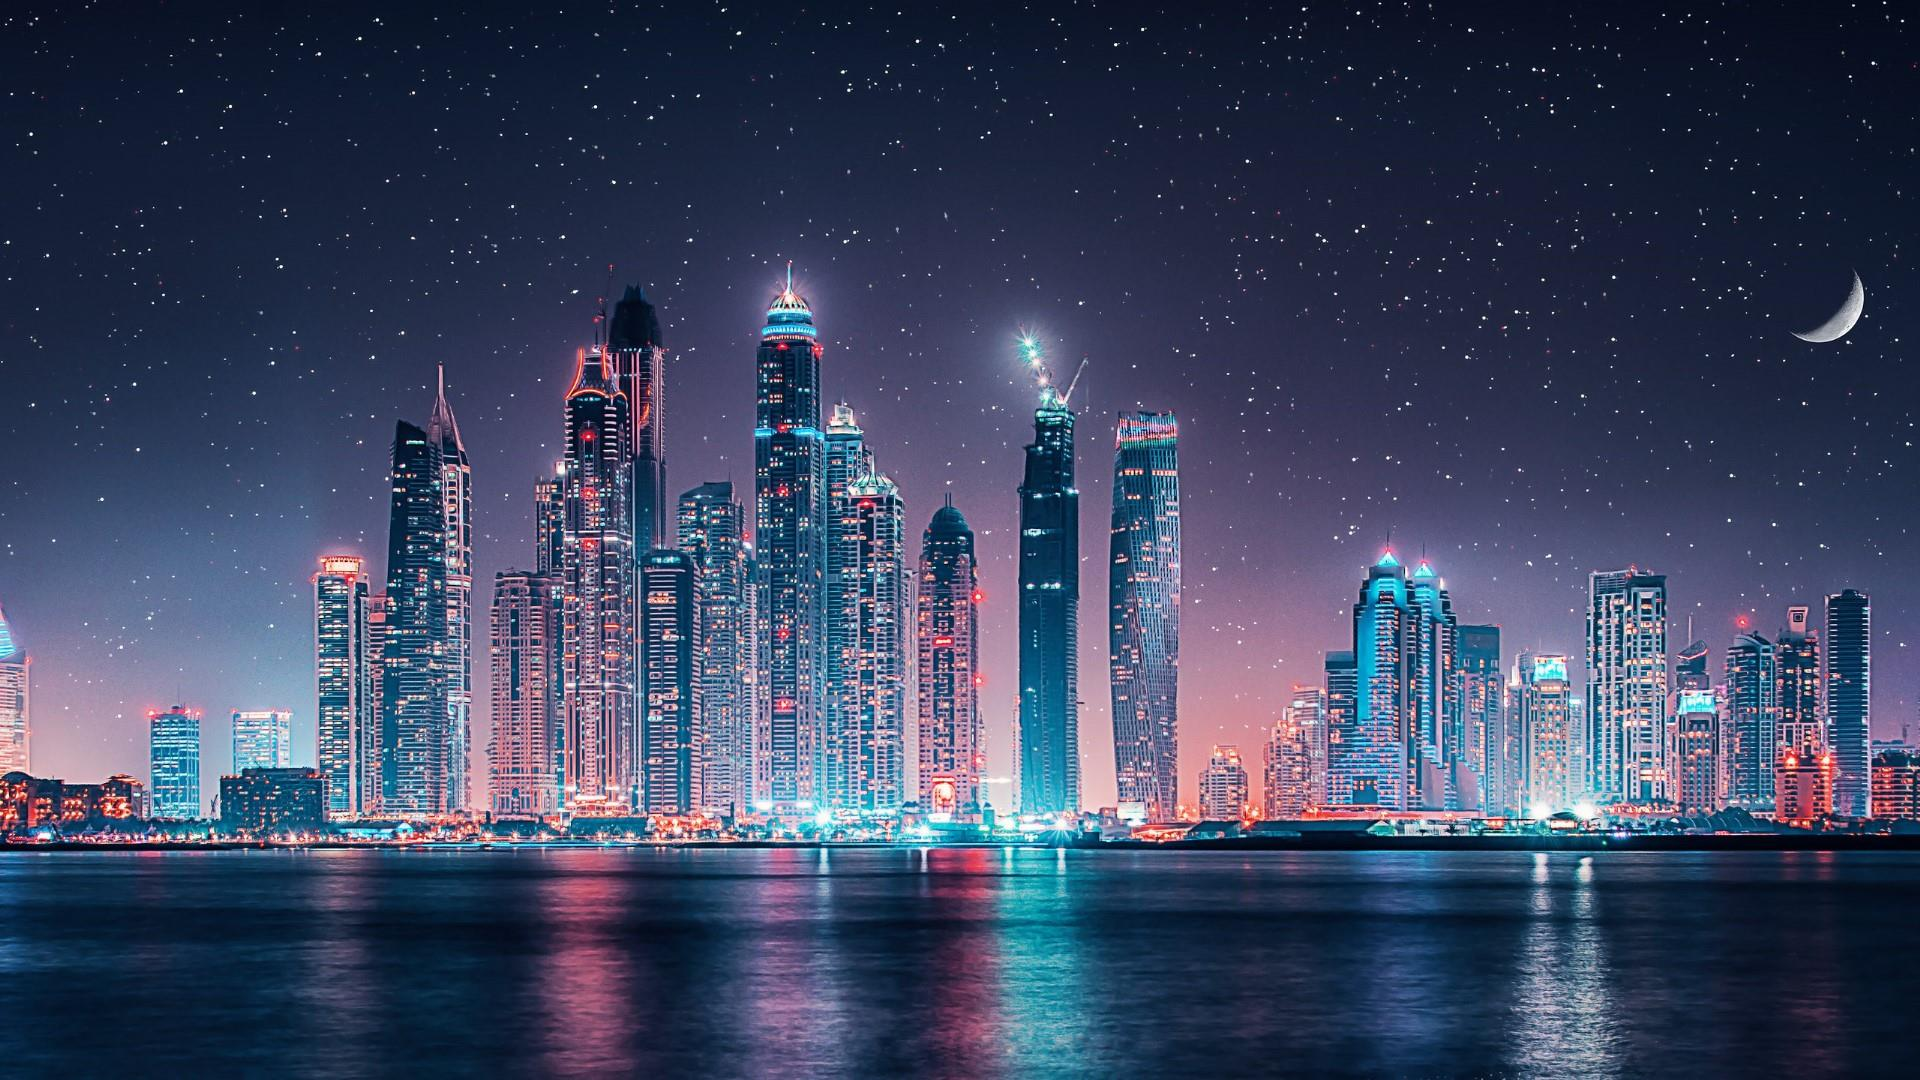 Skyline at night wallpapers top free skyline at night backgrounds wallpaperaccess - Skyline night wallpaper ...